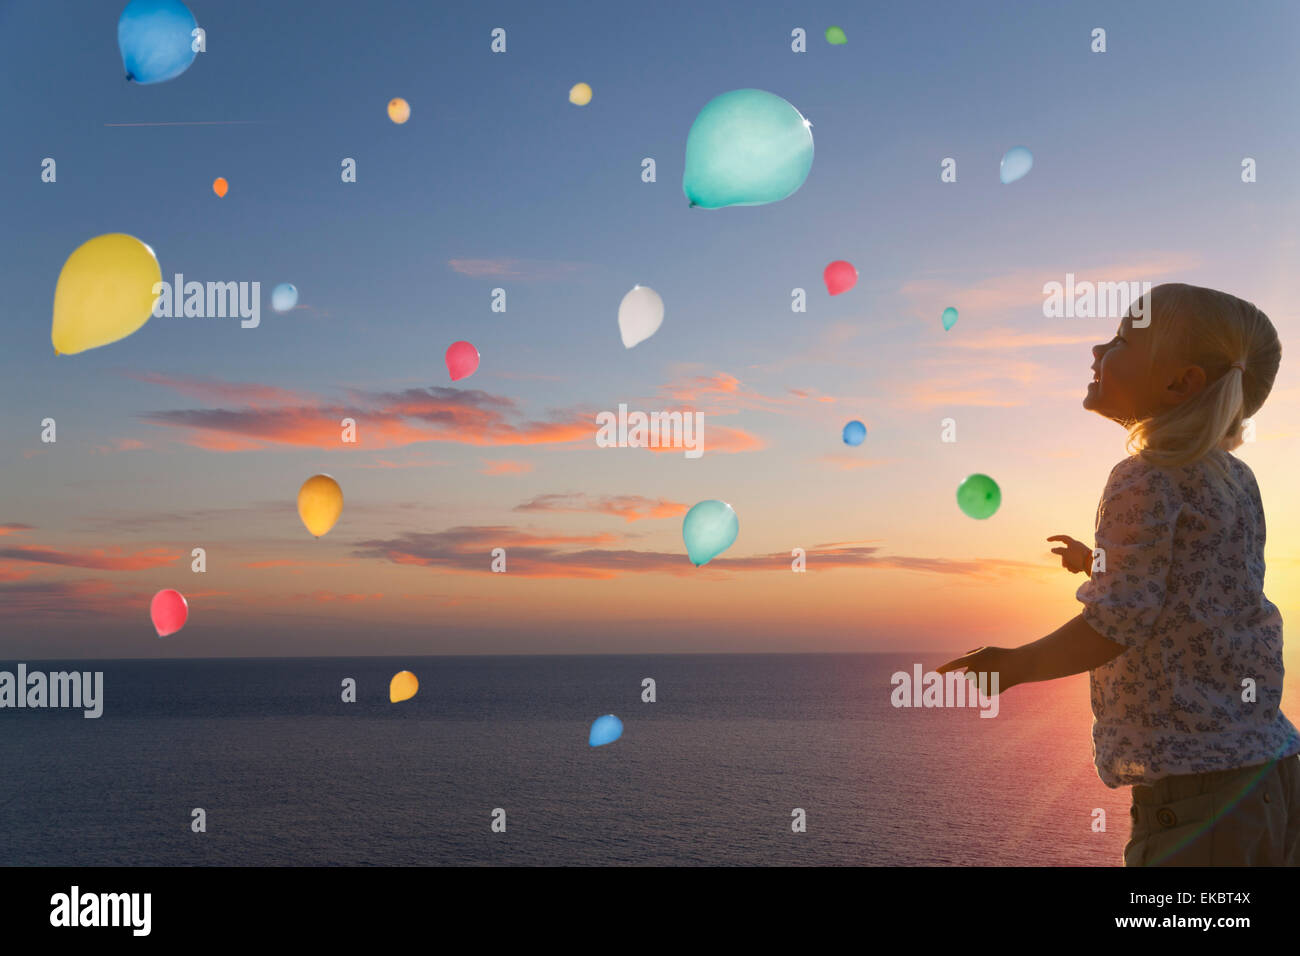 Mädchen beobachten Ballons schweben im Abendhimmel Stockbild